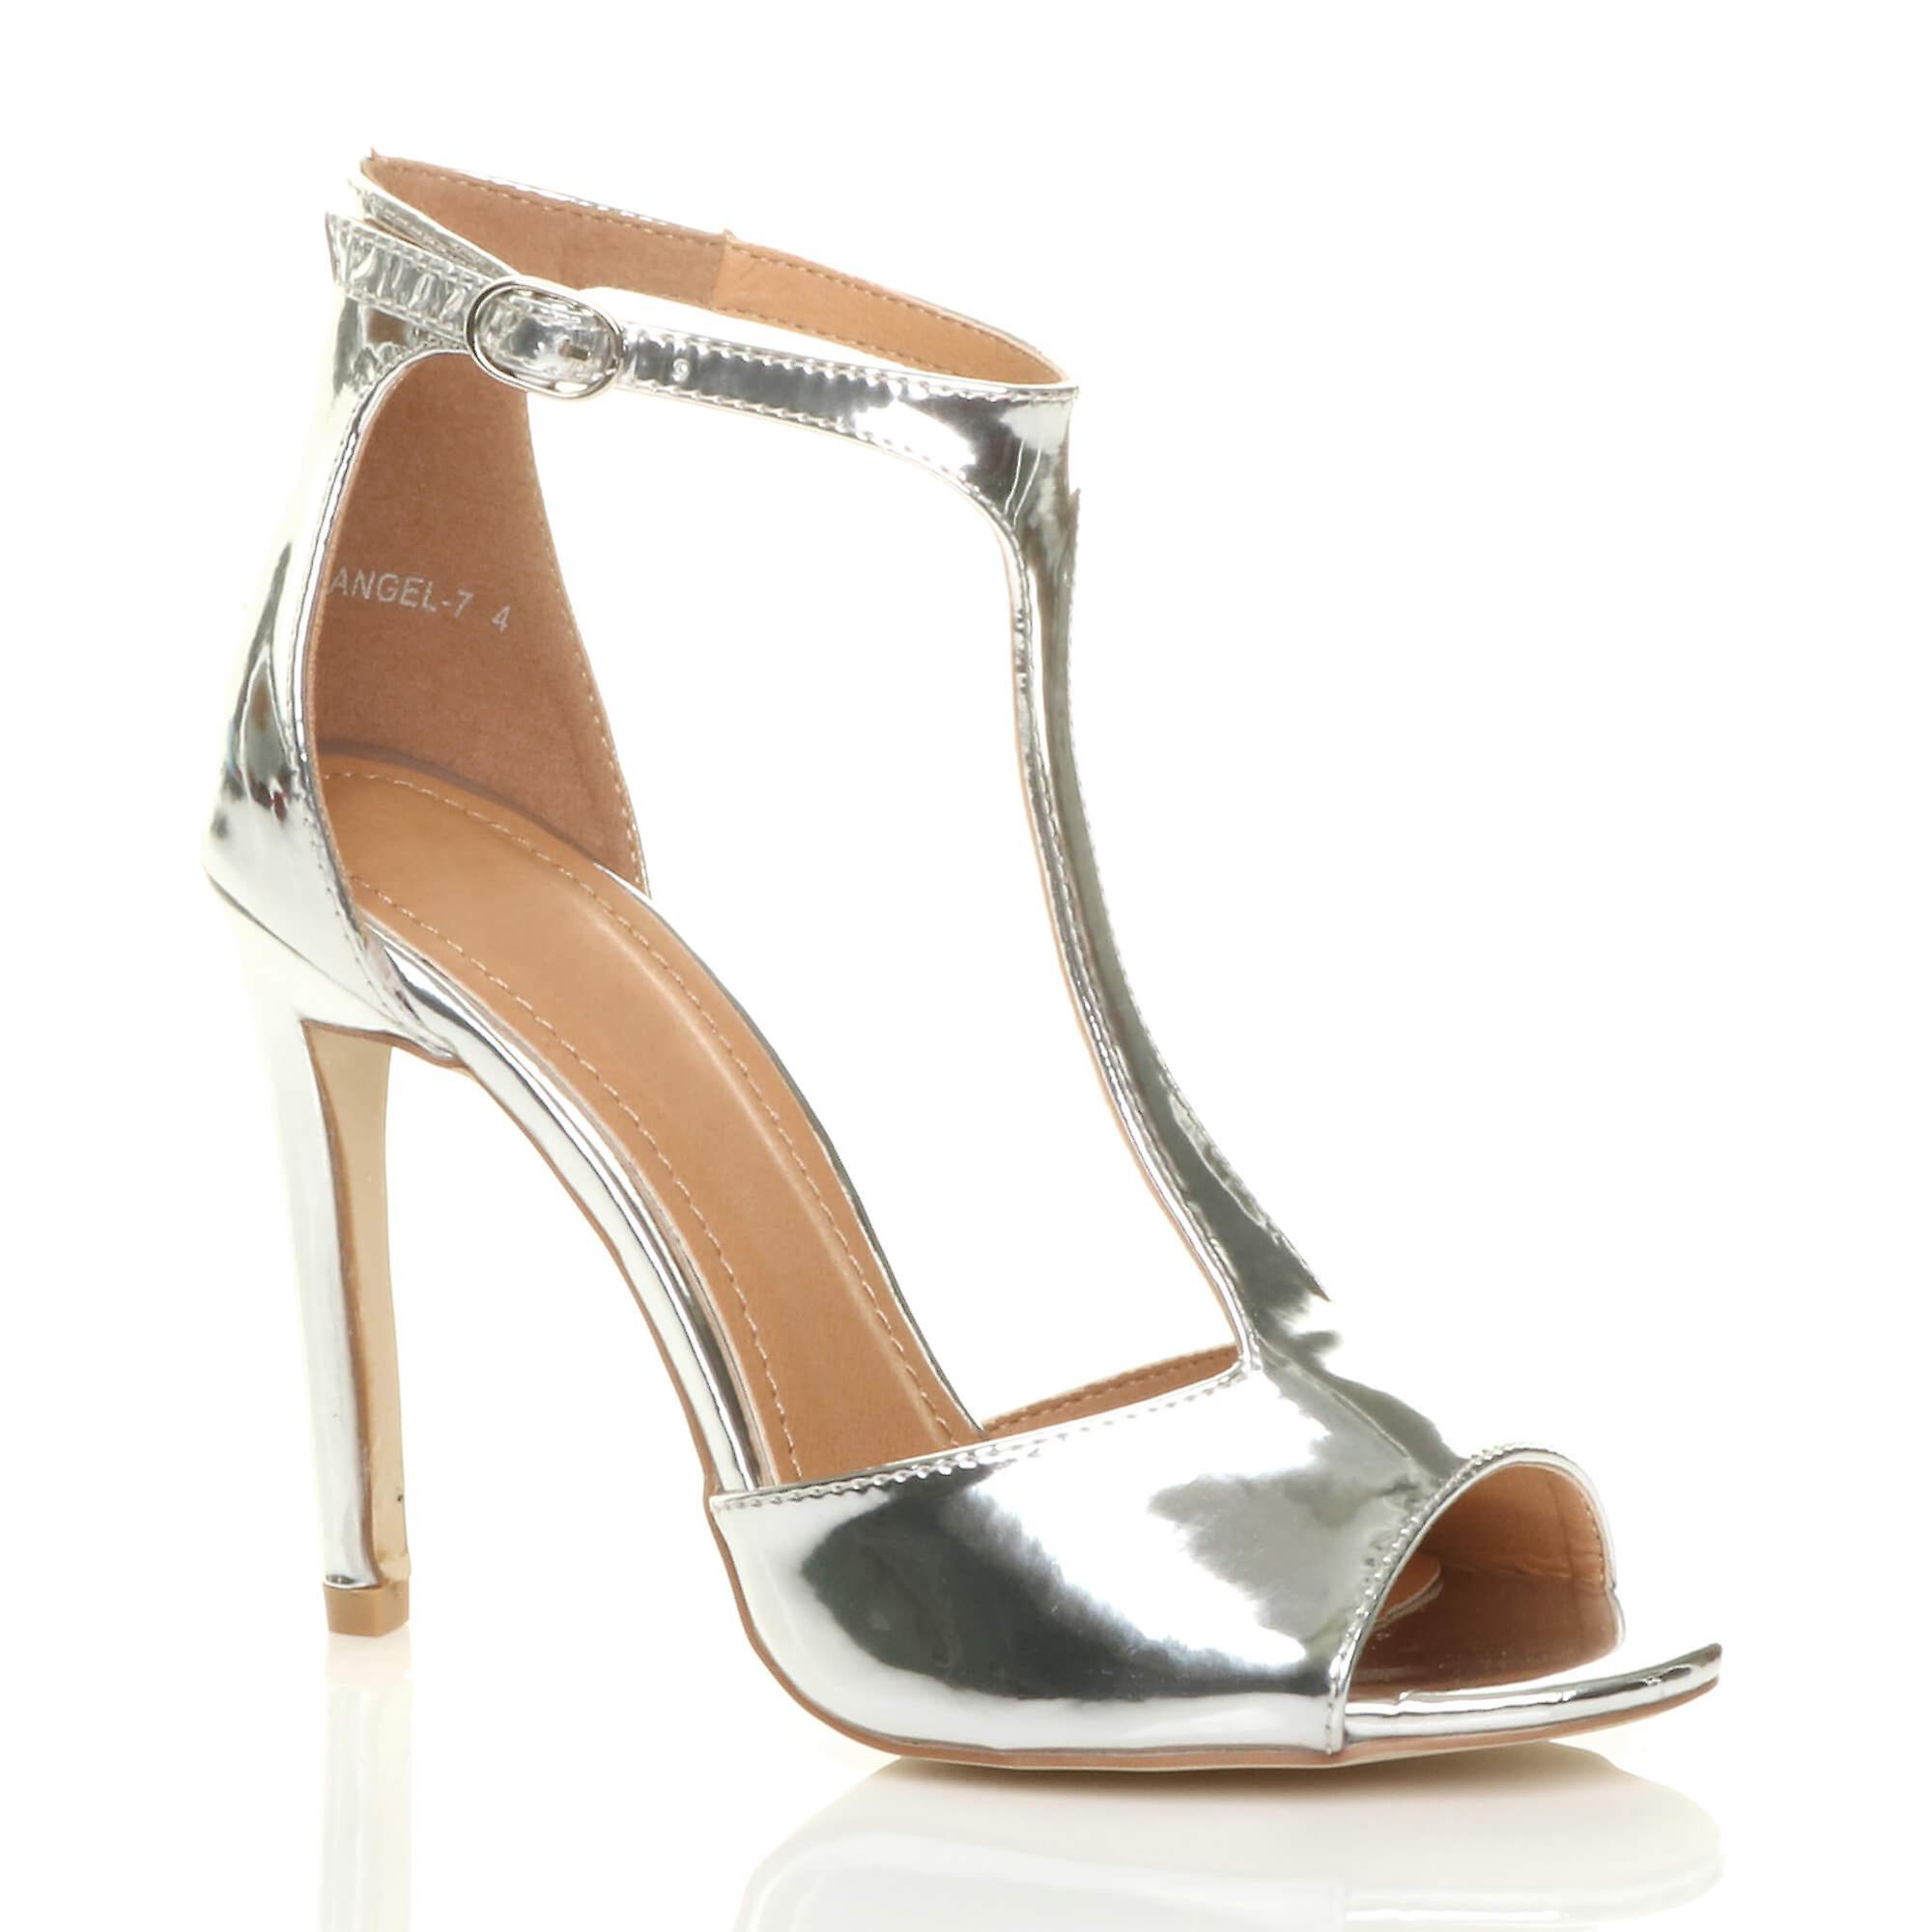 Ajvani Womens high-Heel Schlepplift Knöchel Riemen Partei Sandalen Peep Toe Schuhe Größe